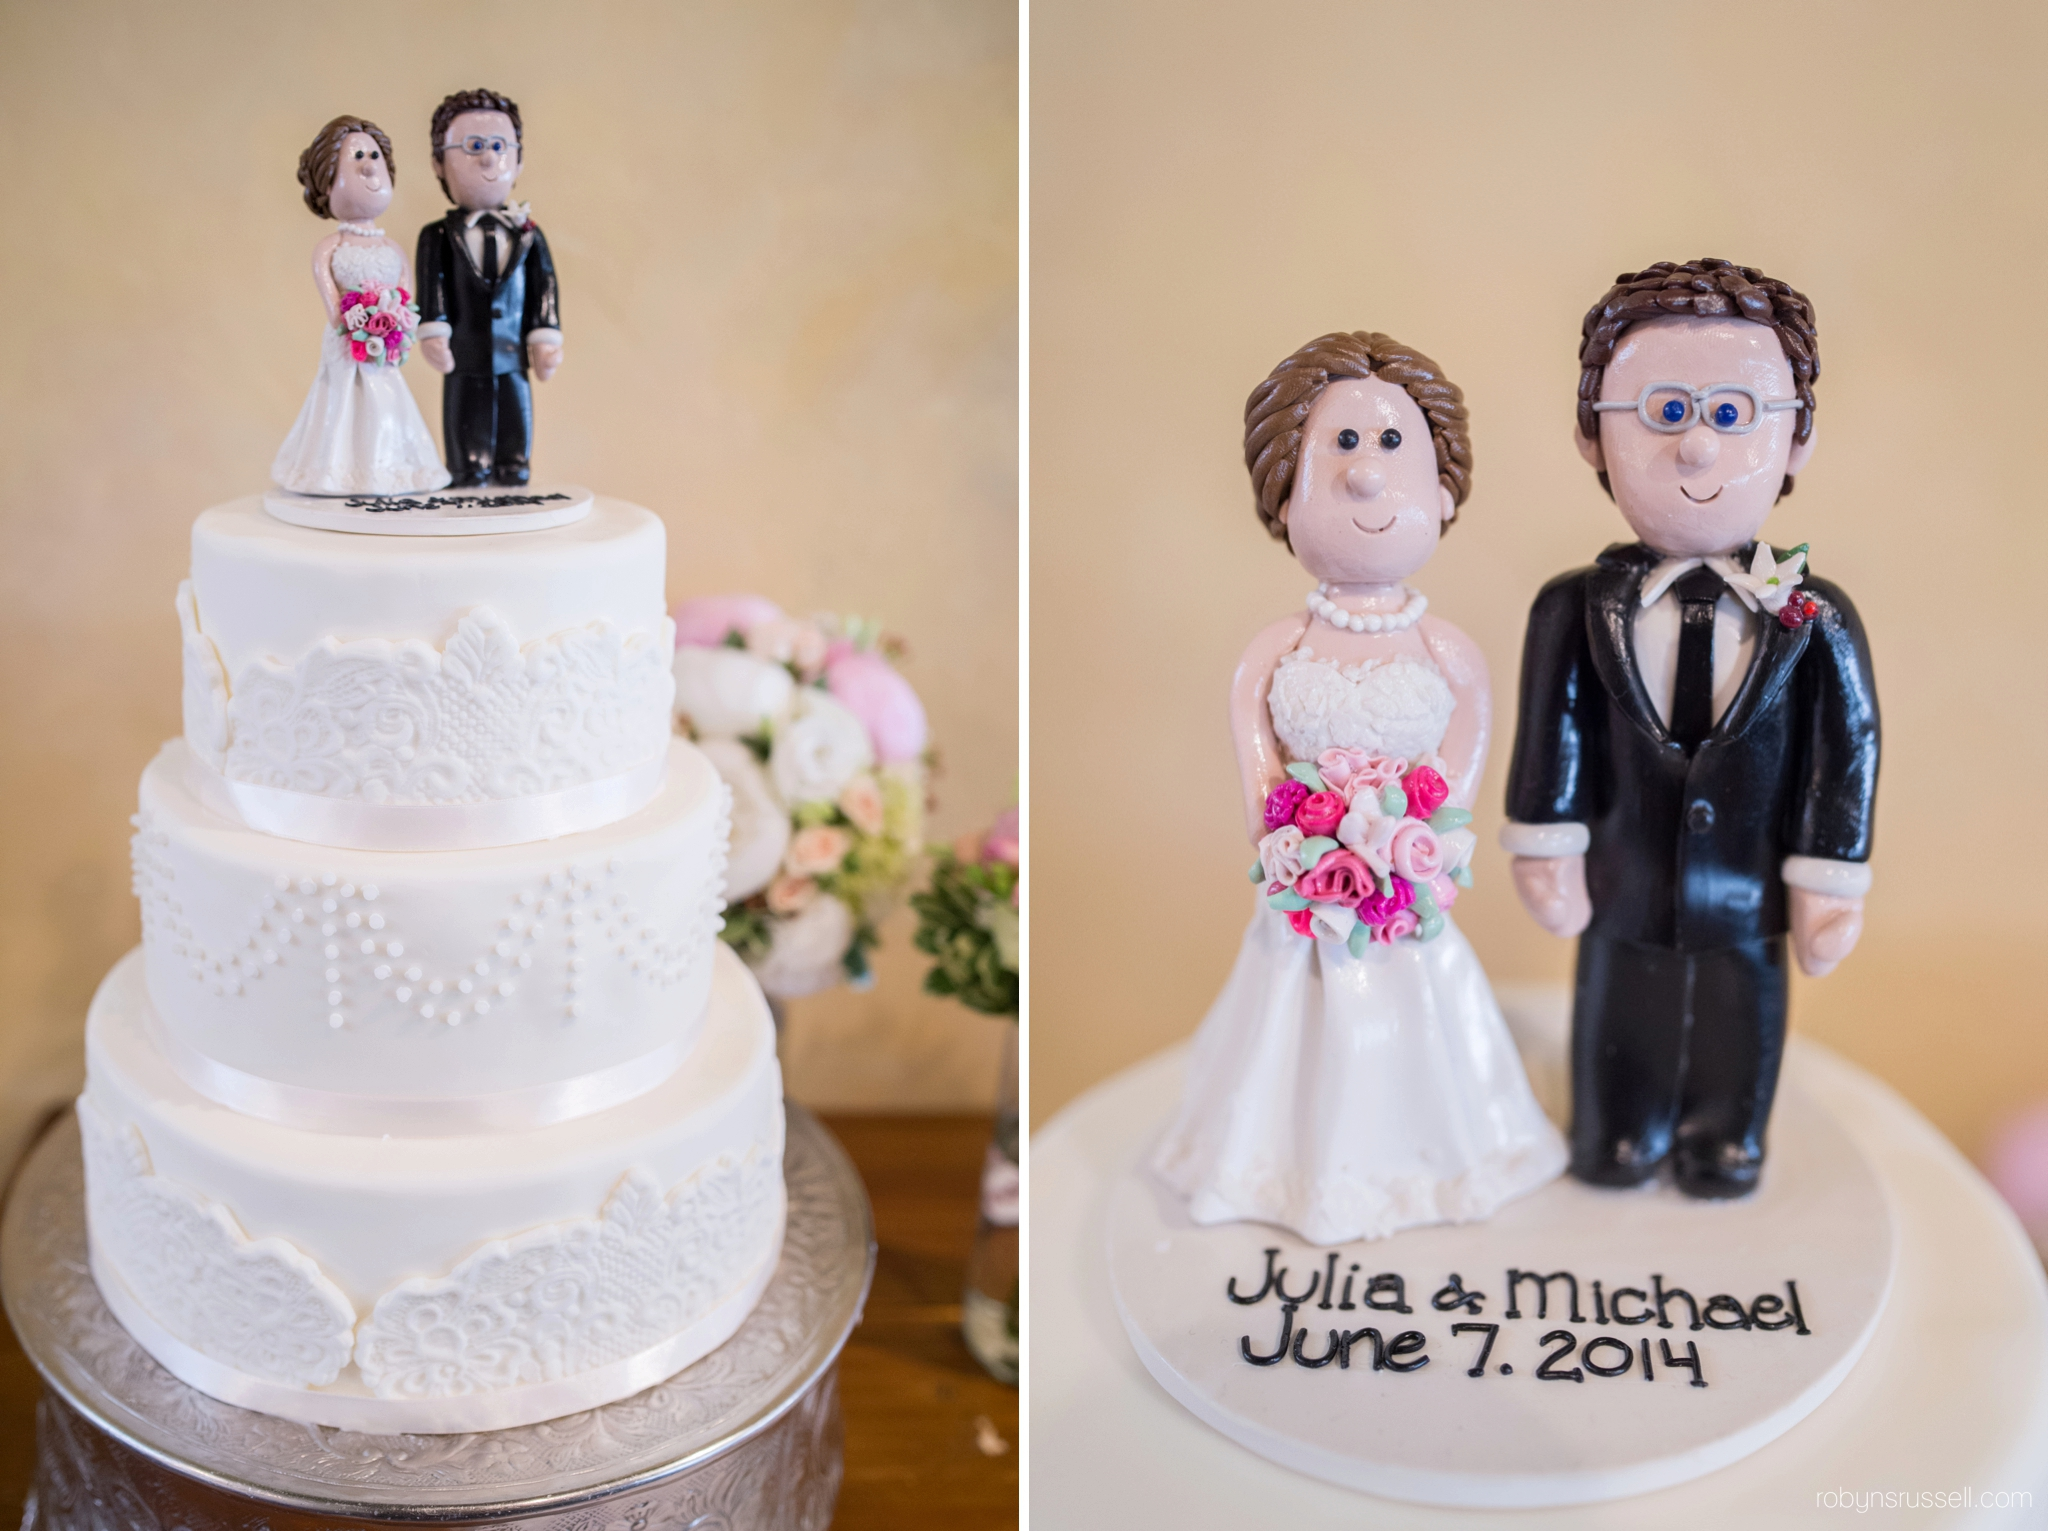 35-wedding-cake-by-inn-on-the-twenty-in-jordan.jpg